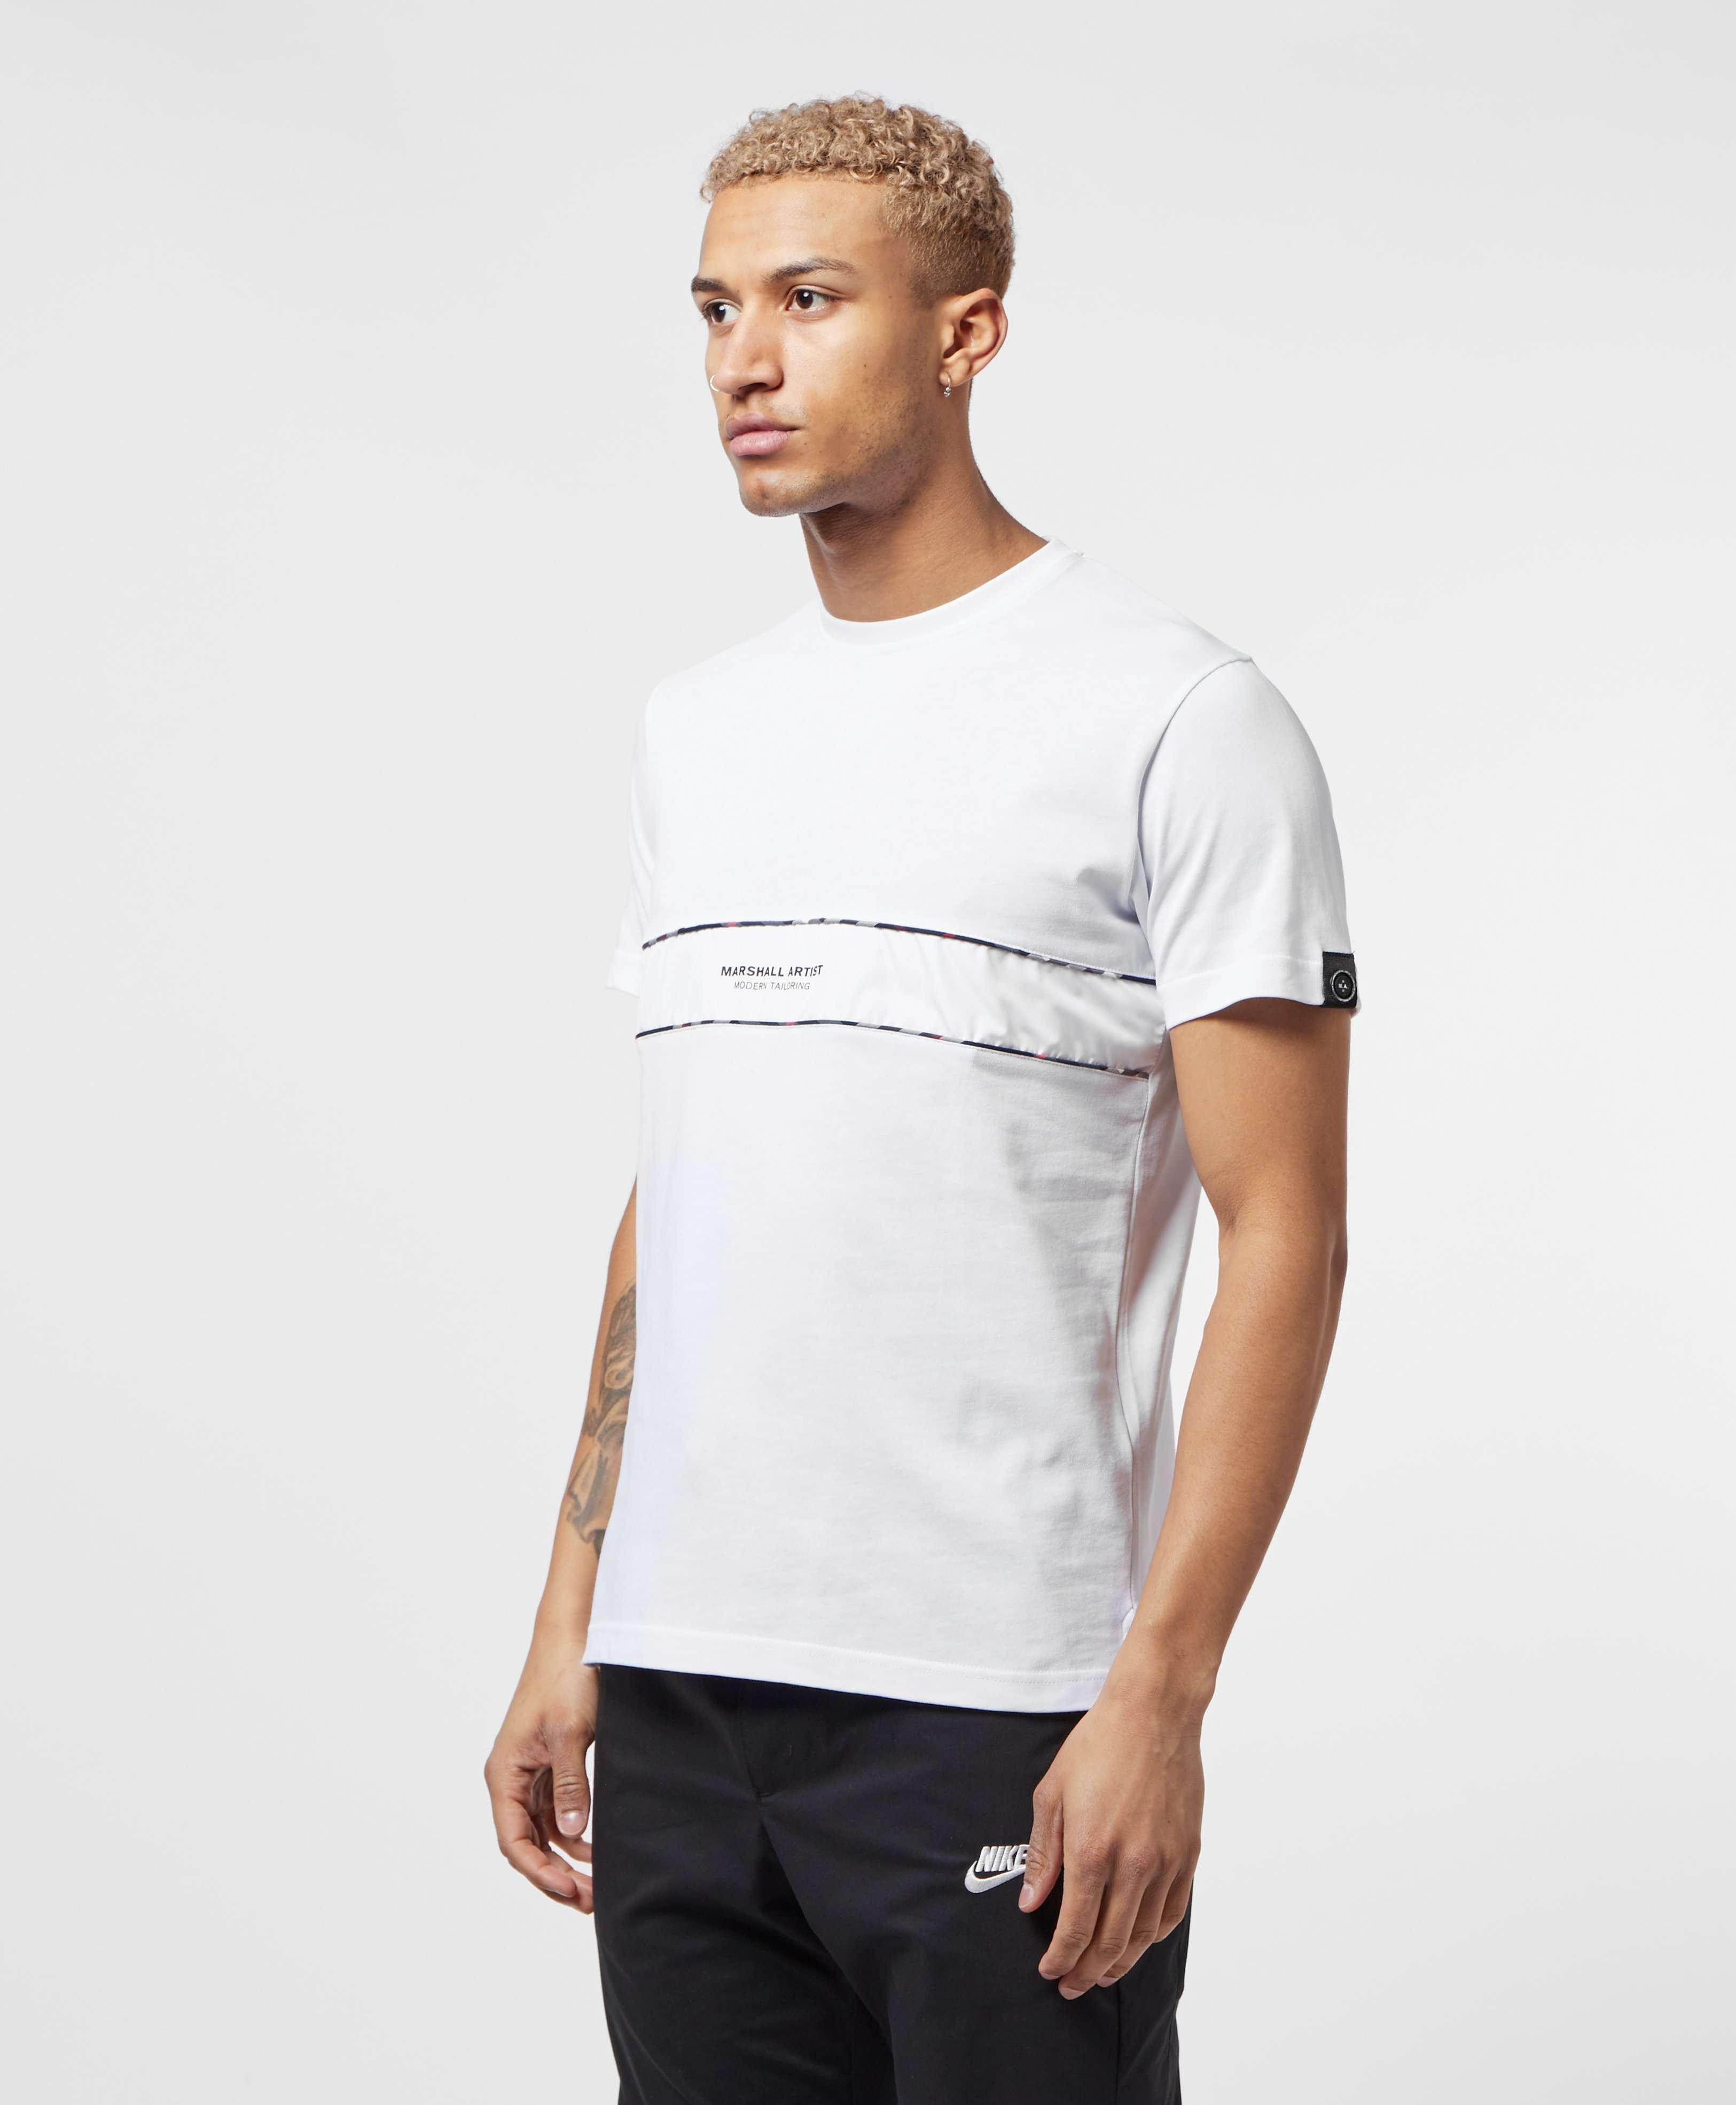 Marshall Artist Panel Check Short Sleeve T-Shirt